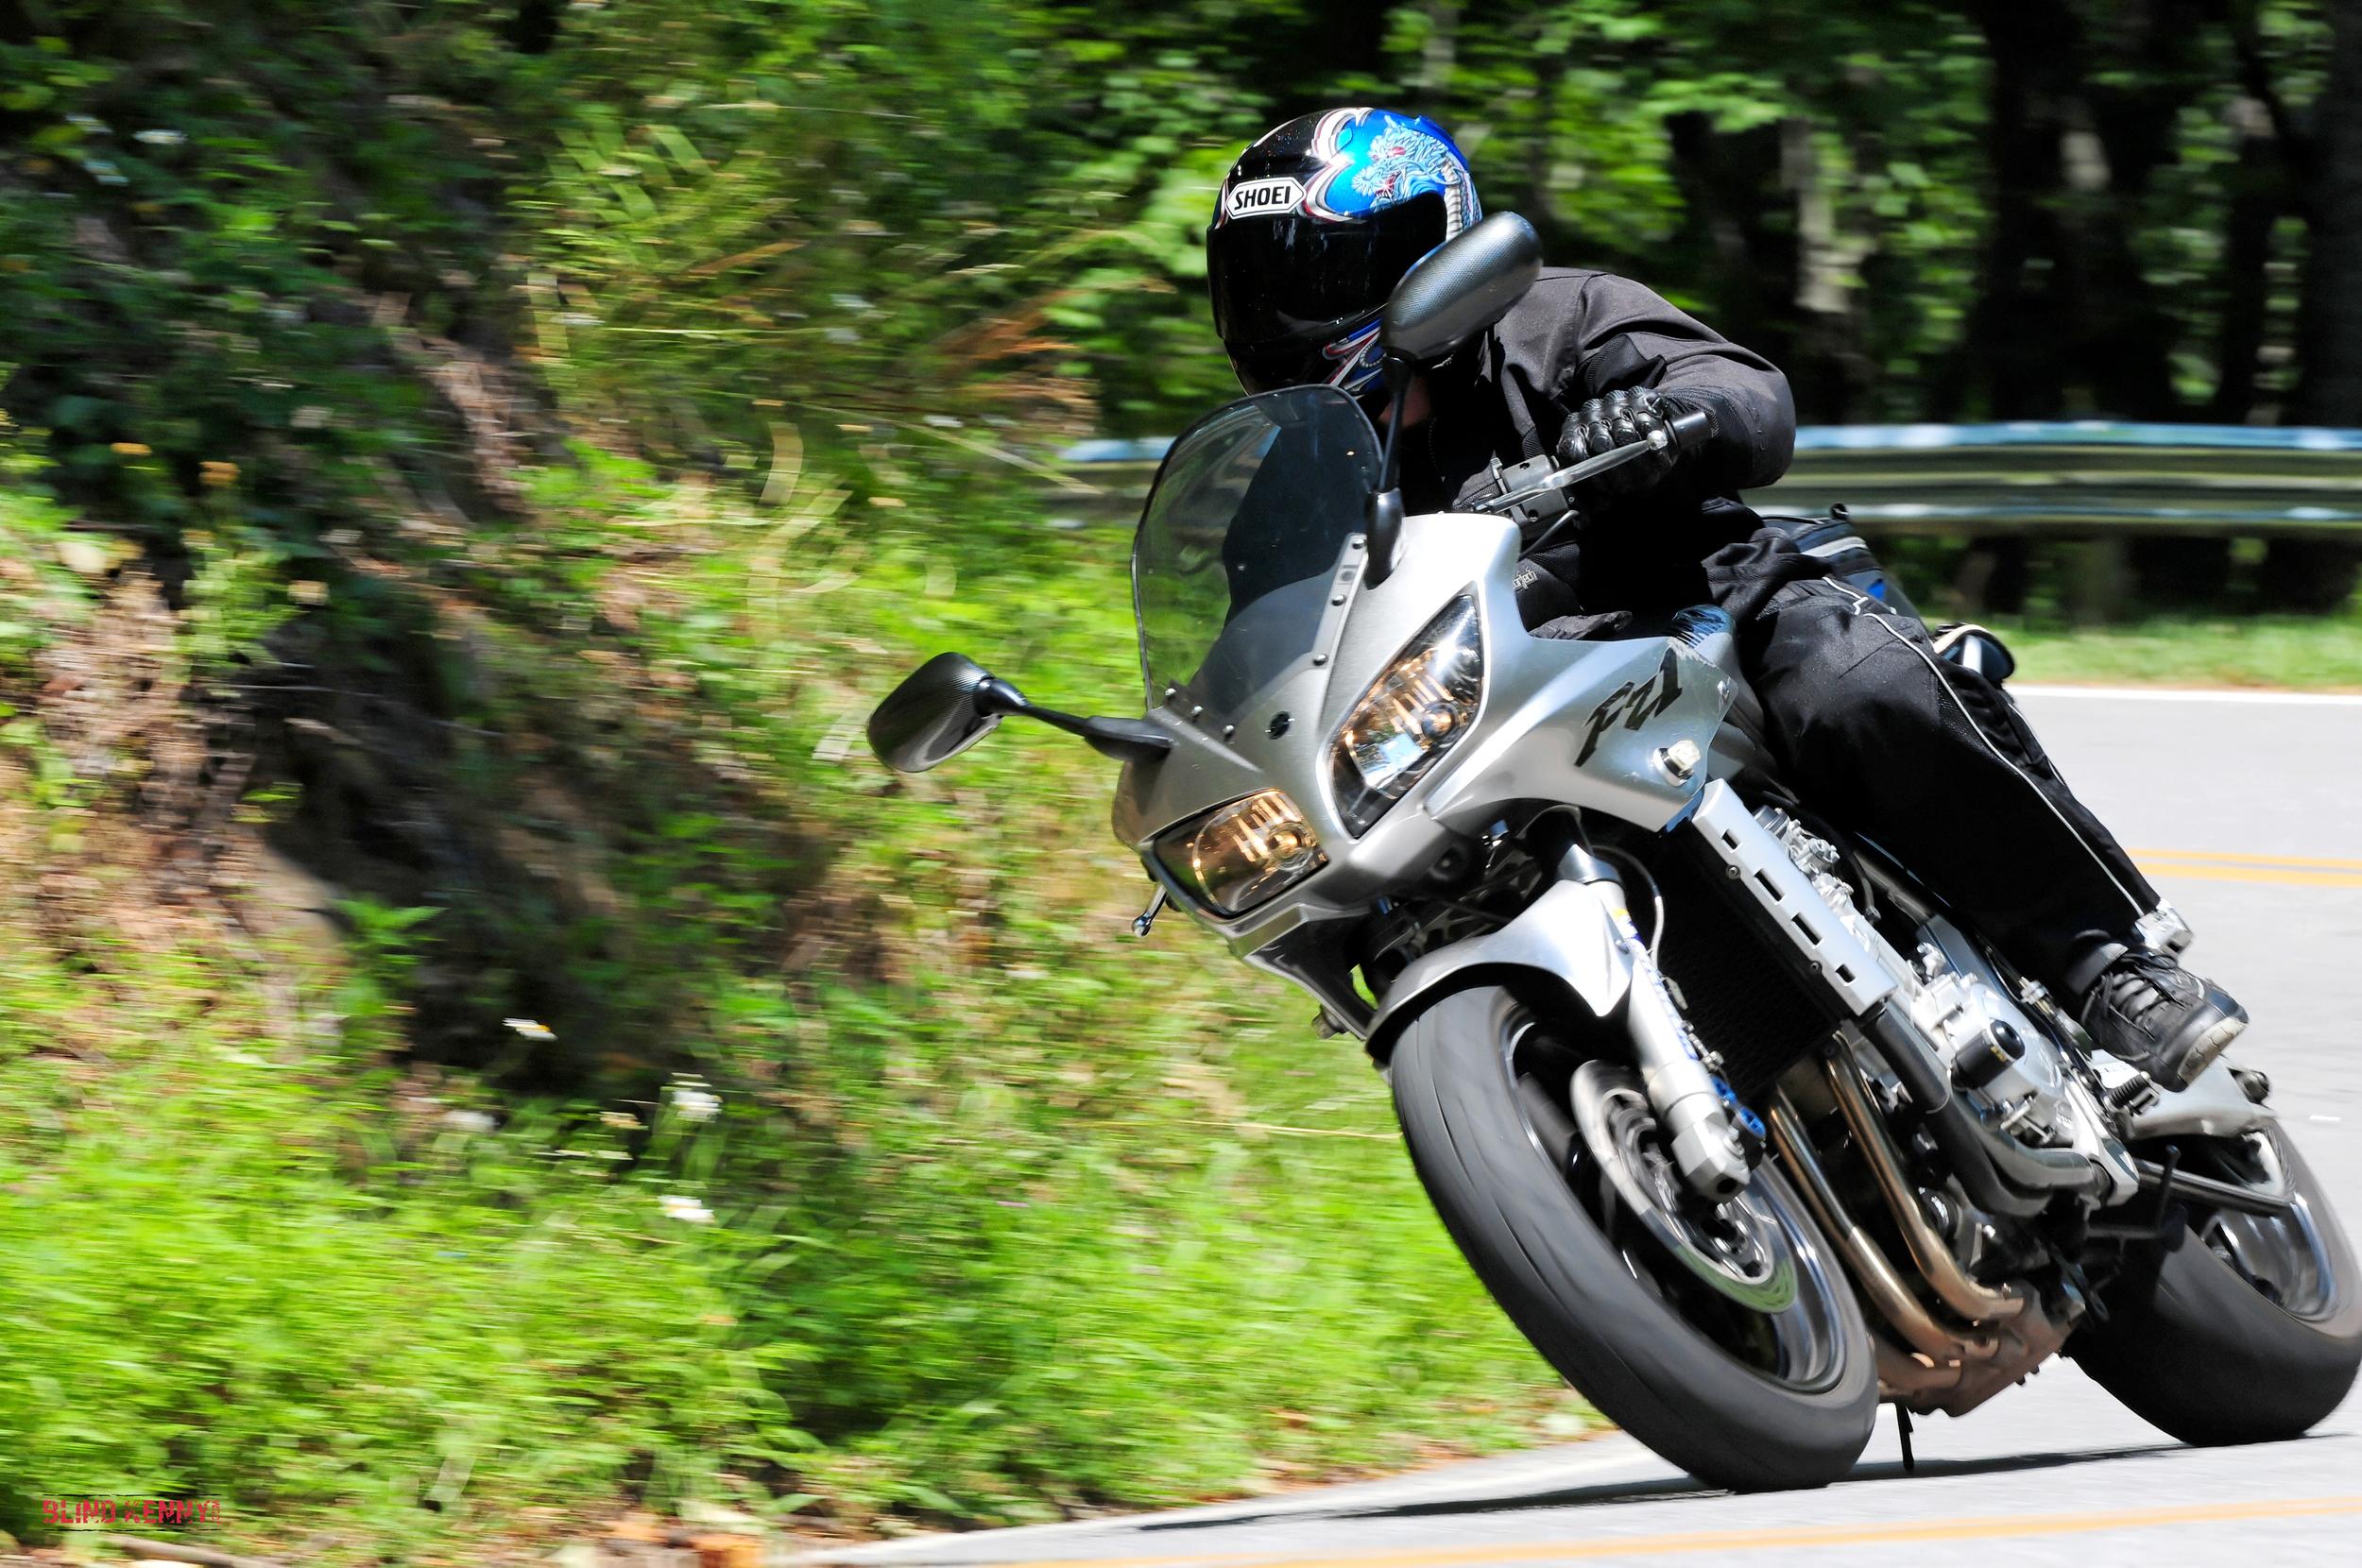 Riding on NC80